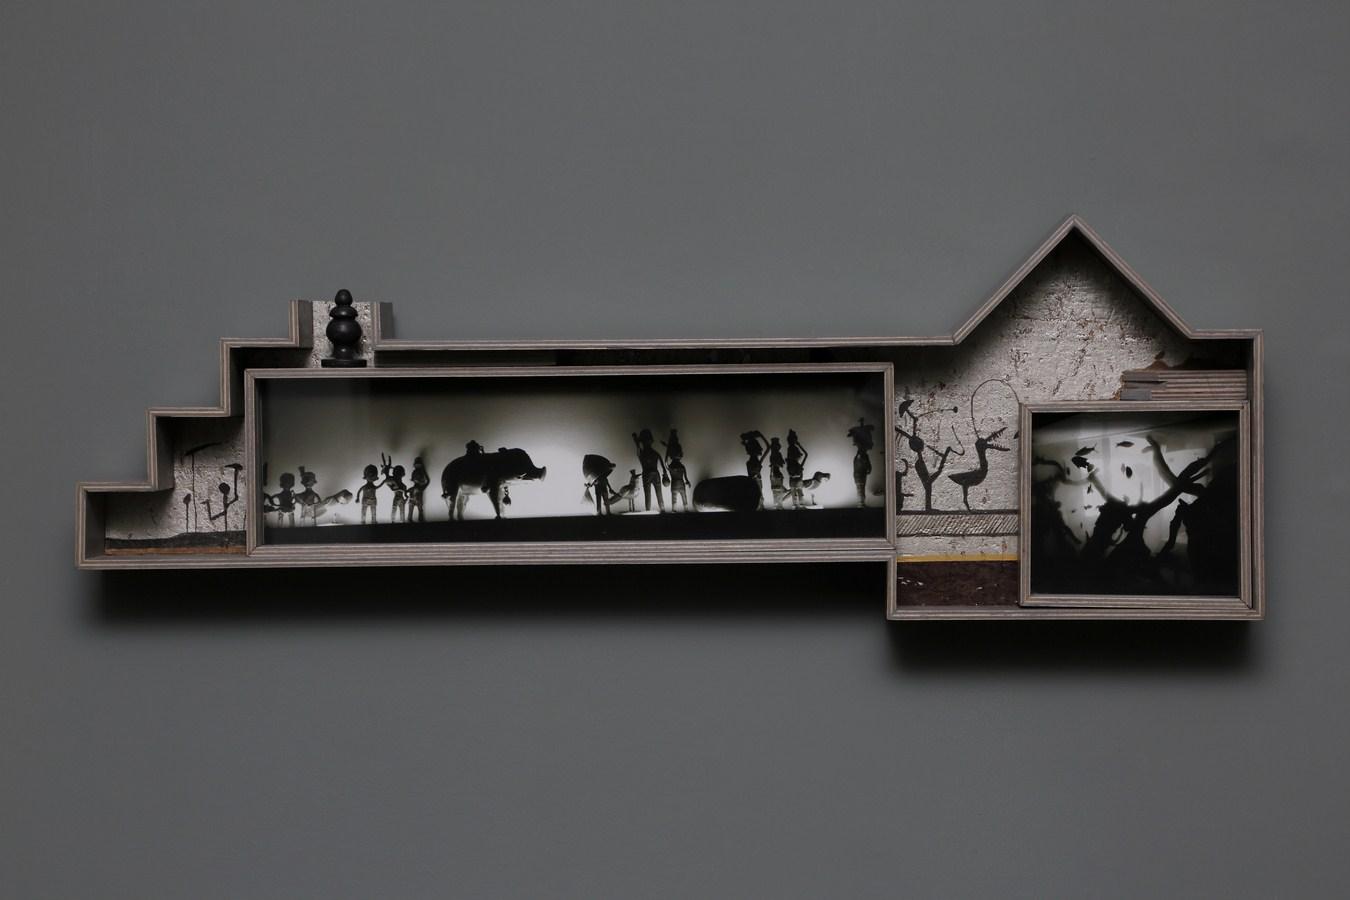 "Dweller of Metropolis - III | Paper Mache, photograph, plywood, wood, acrylic, wallpaper, auto paint | 10.5"" x 30.5"" | 2017"